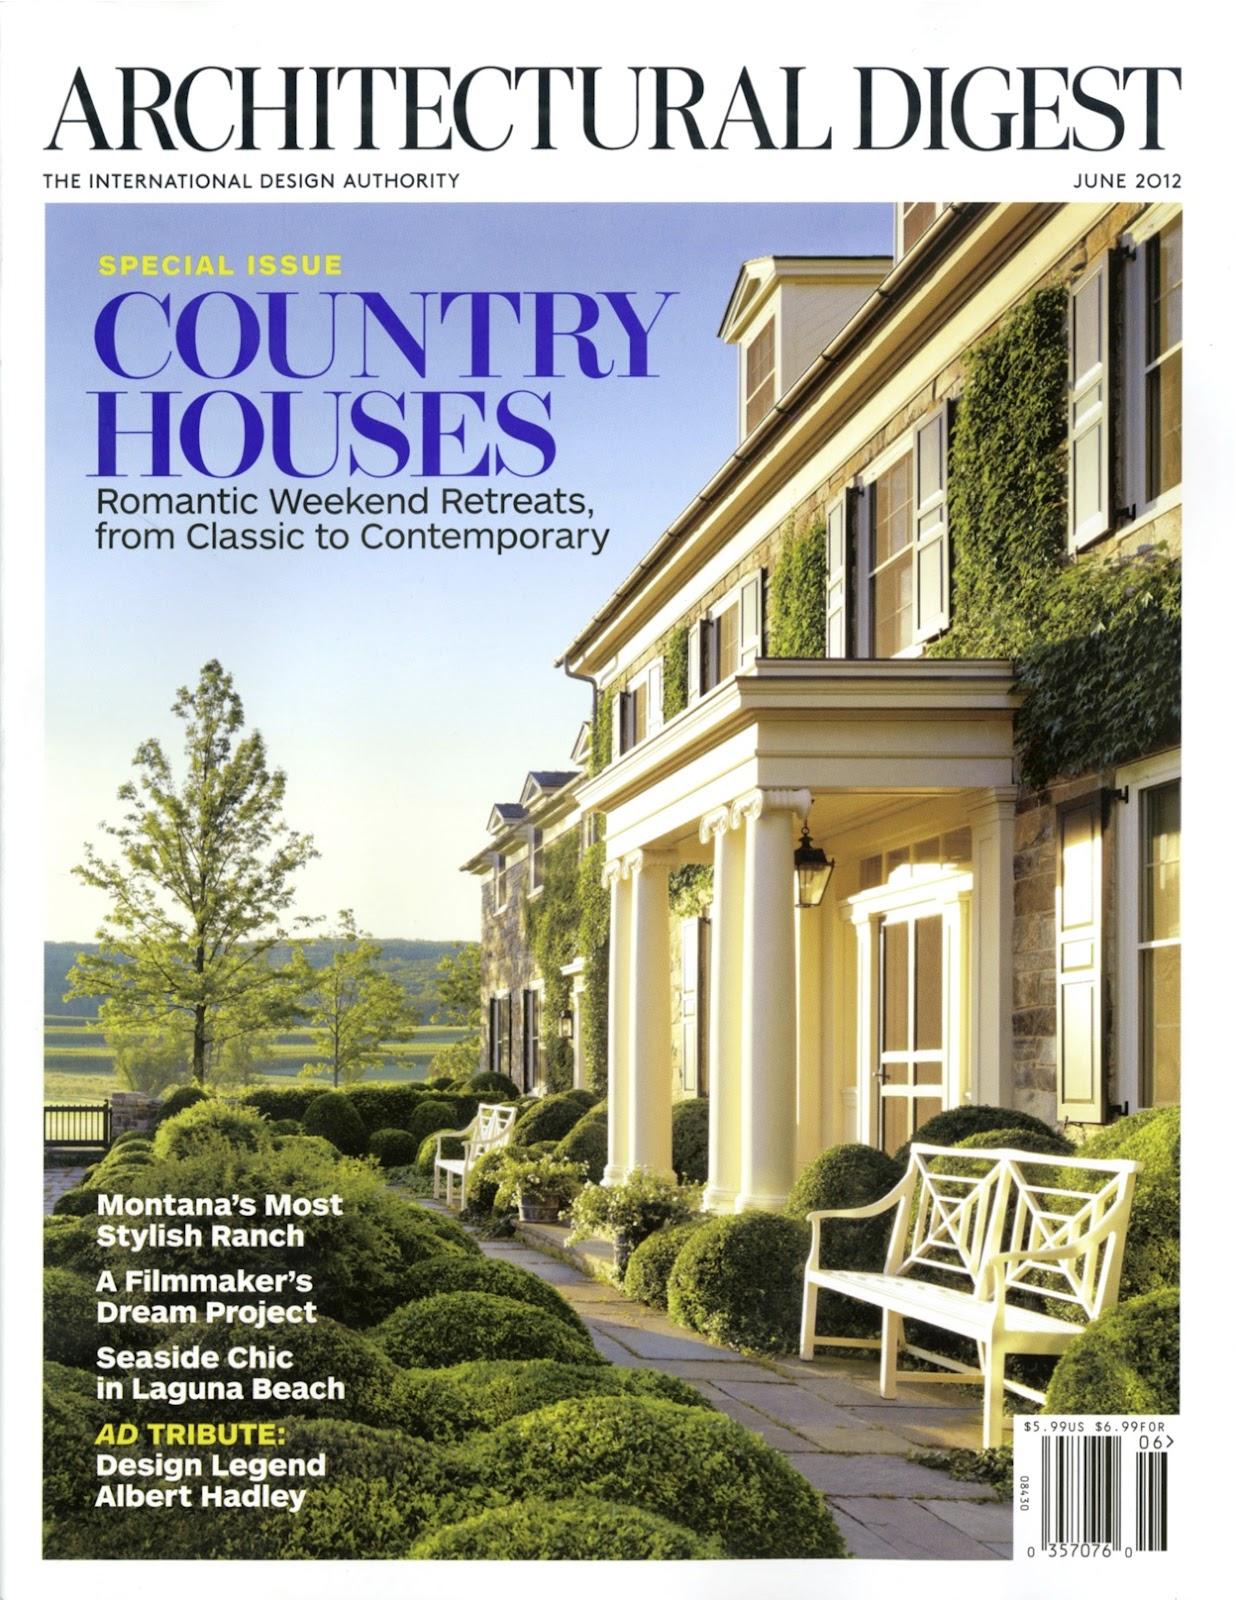 Architectural Digest: Atelier&Co: Architectural Digest June 2012 Featuring Ravenwood